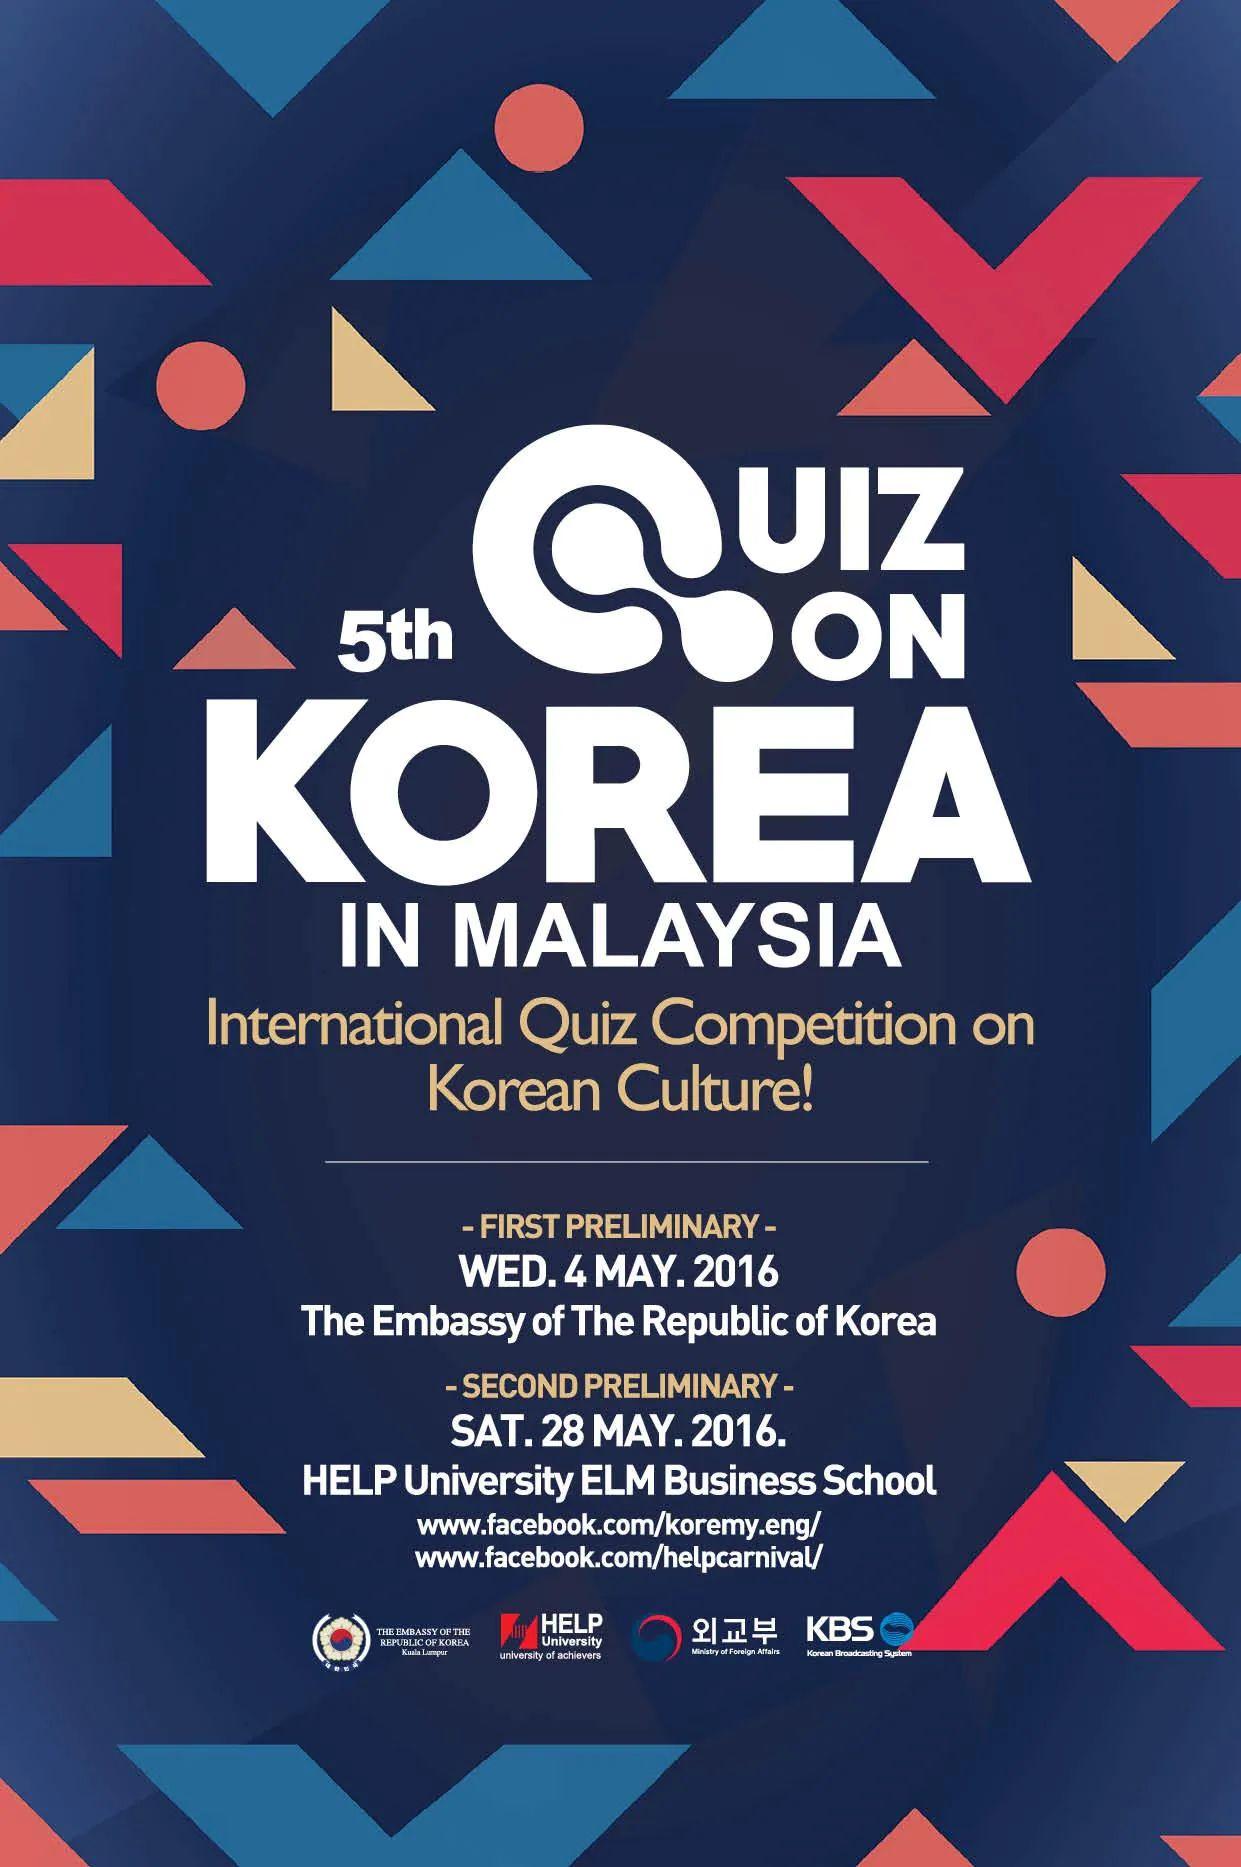 Korean poster design - Design Quiz Poster Quiz On Korea Poster Download